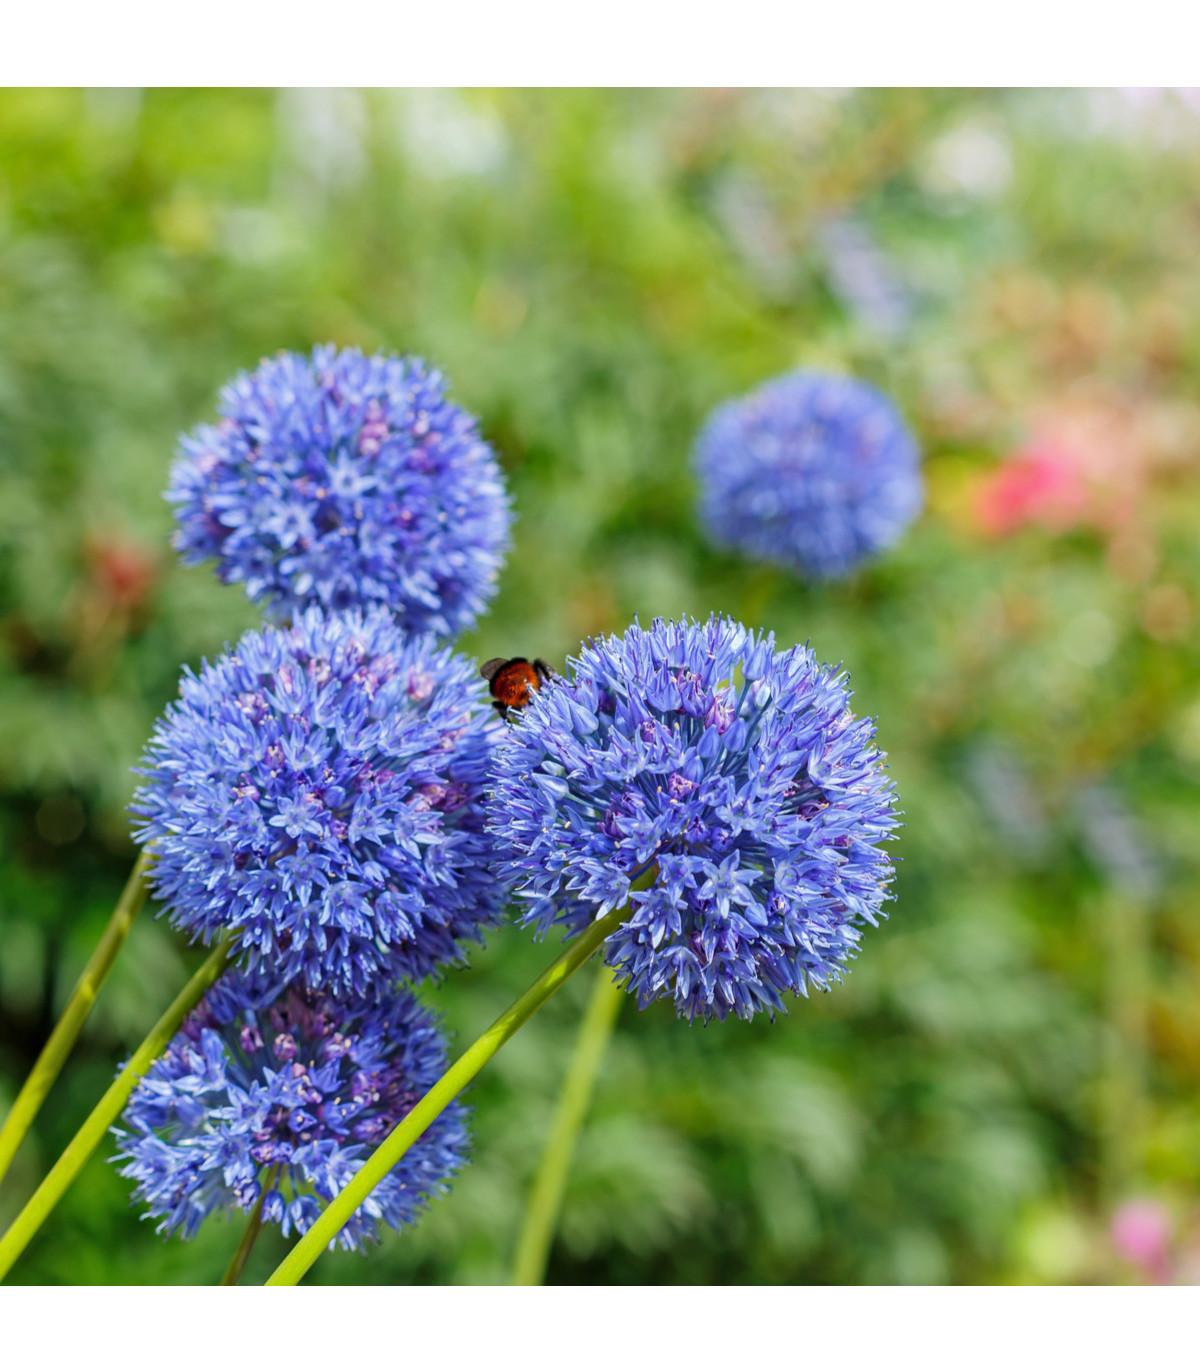 Cesnak azúrový - Allium caeruleum - holandské cibuľoviny - 3 ks